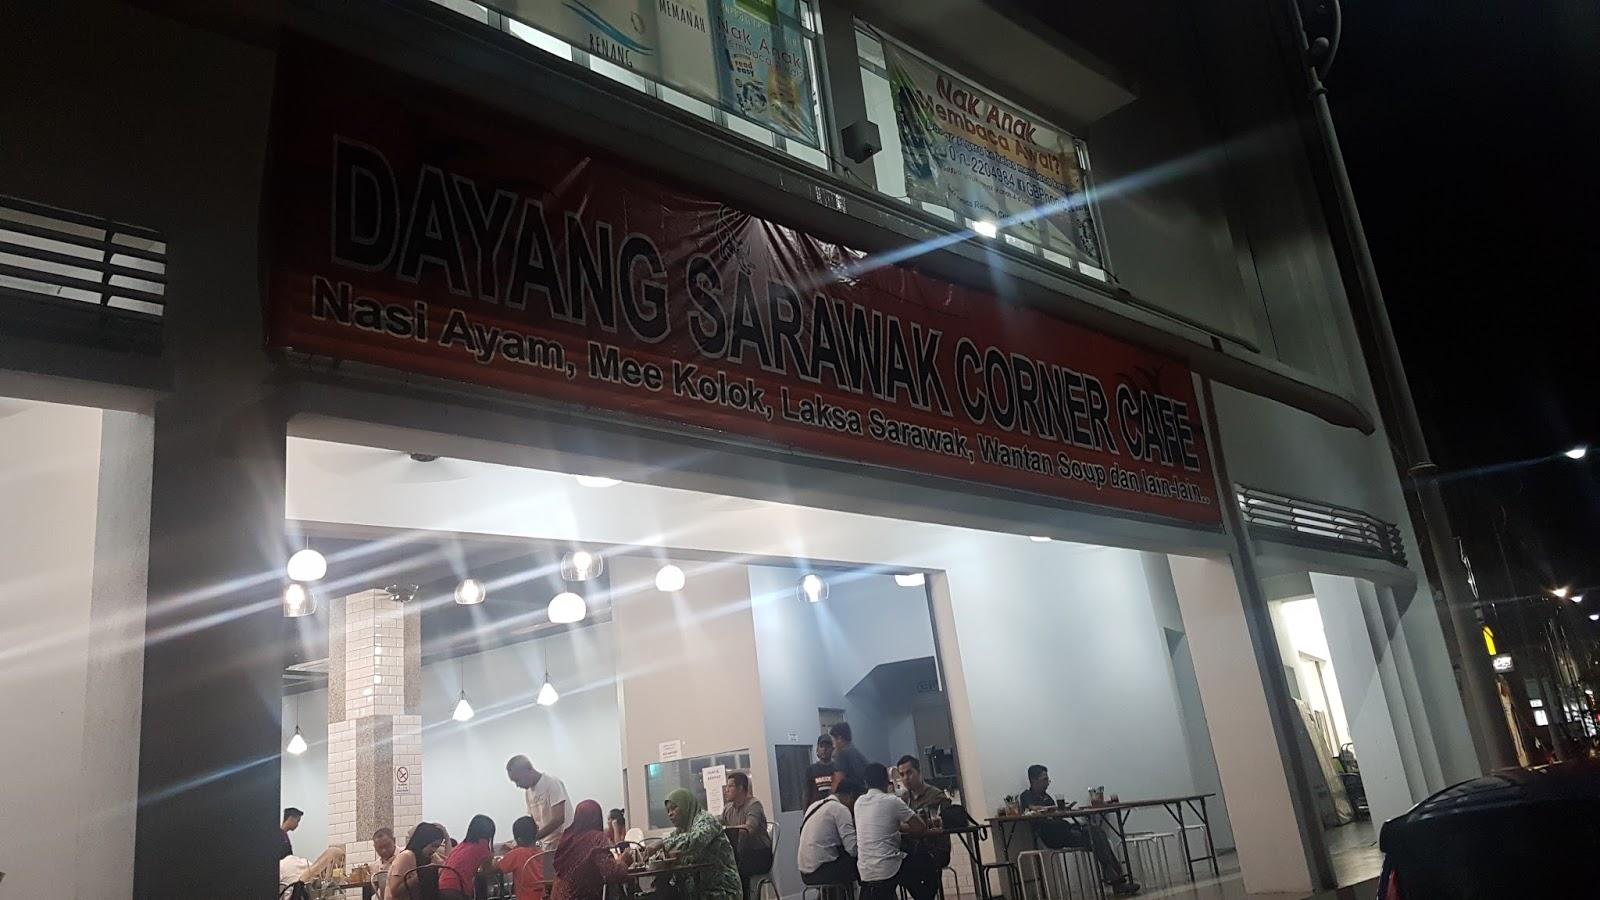 Ni Gila Makanan Sarawak Sebab Dah 3 Kali Ke Sana Bersama Layan Mee Kolok Hahaha So Bila Buka Dayang Haruslah Tak Lepas Kan Peluang